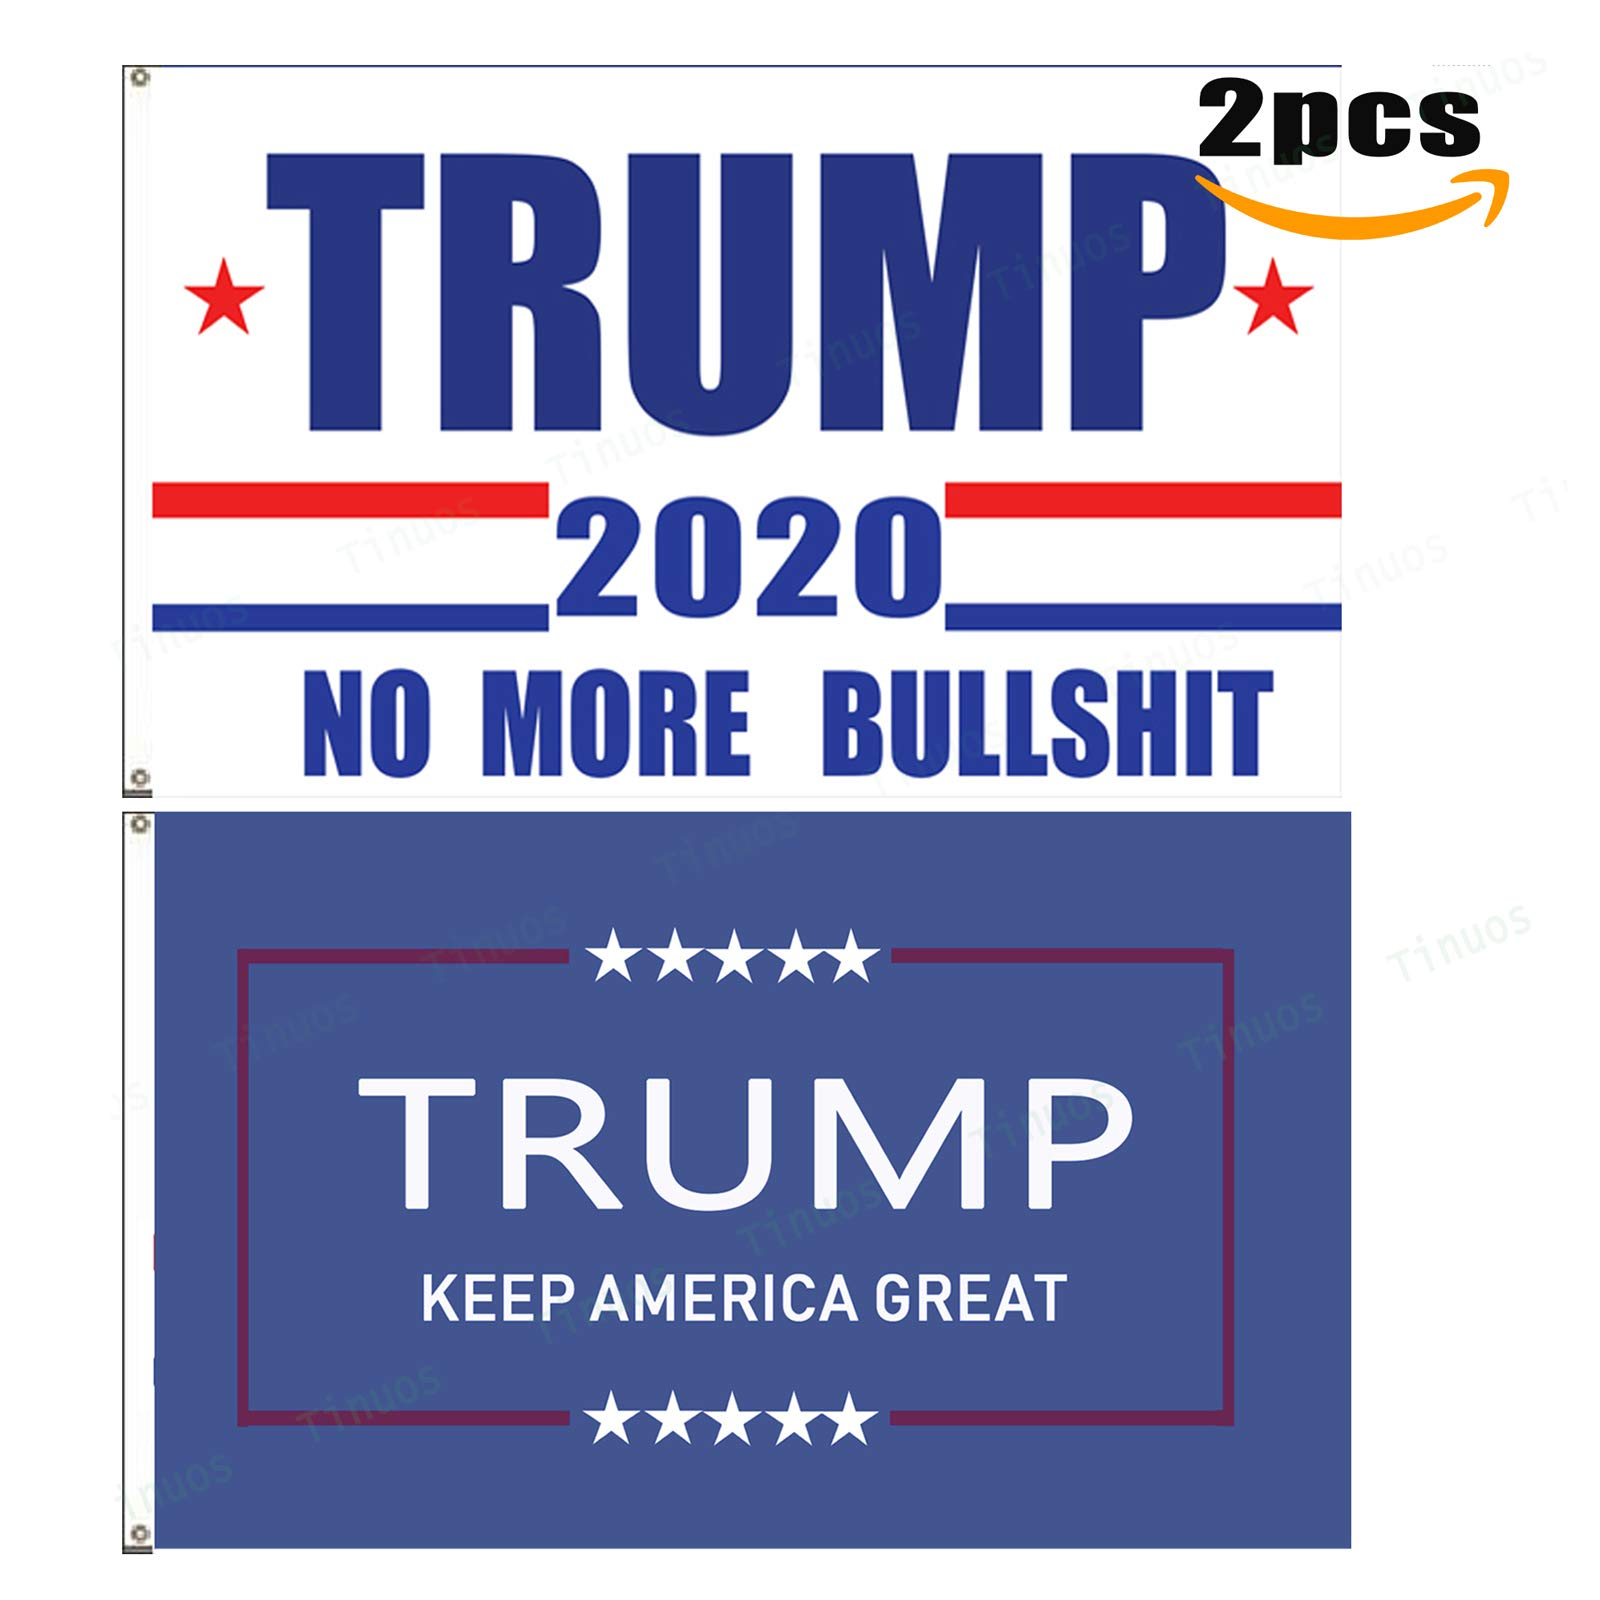 Tinuos Trump Flag-Donald Trump Flag-Trump president flag-Donald Trump president flag-2PCs